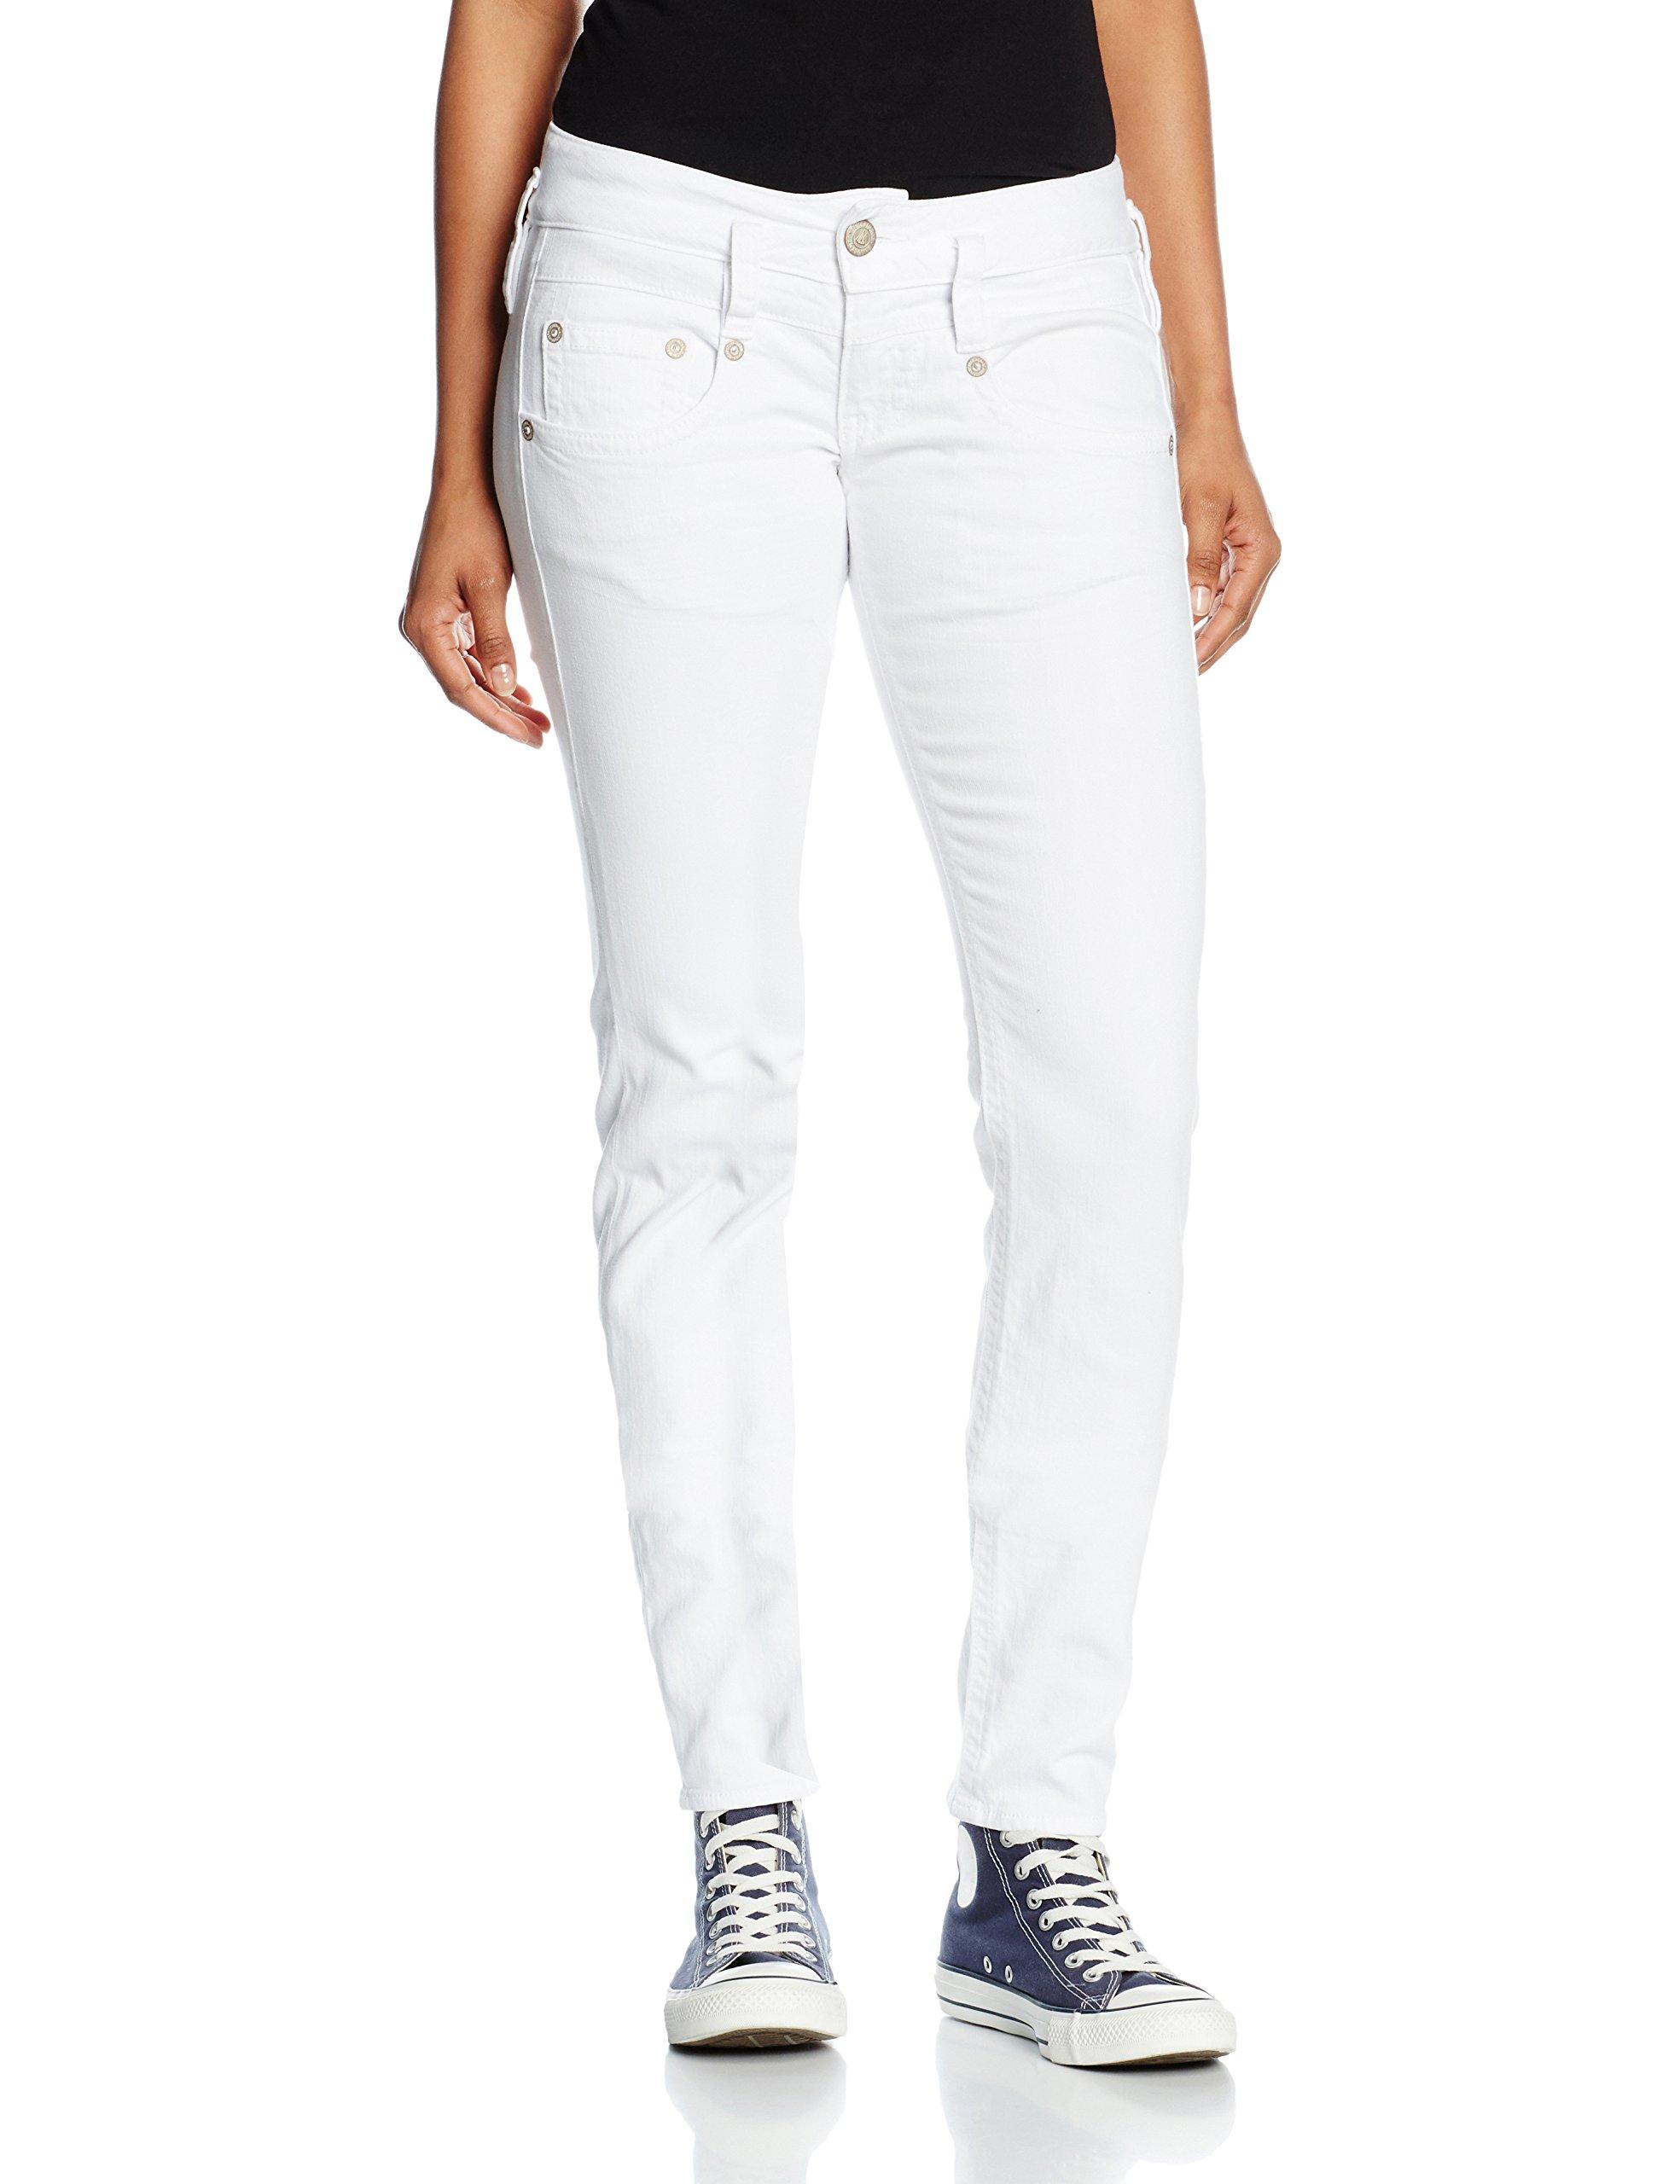 HerrlicherPitch Slim Femme Blancwhite Pantalon l32 10TailleW30 FK1JuTc53l